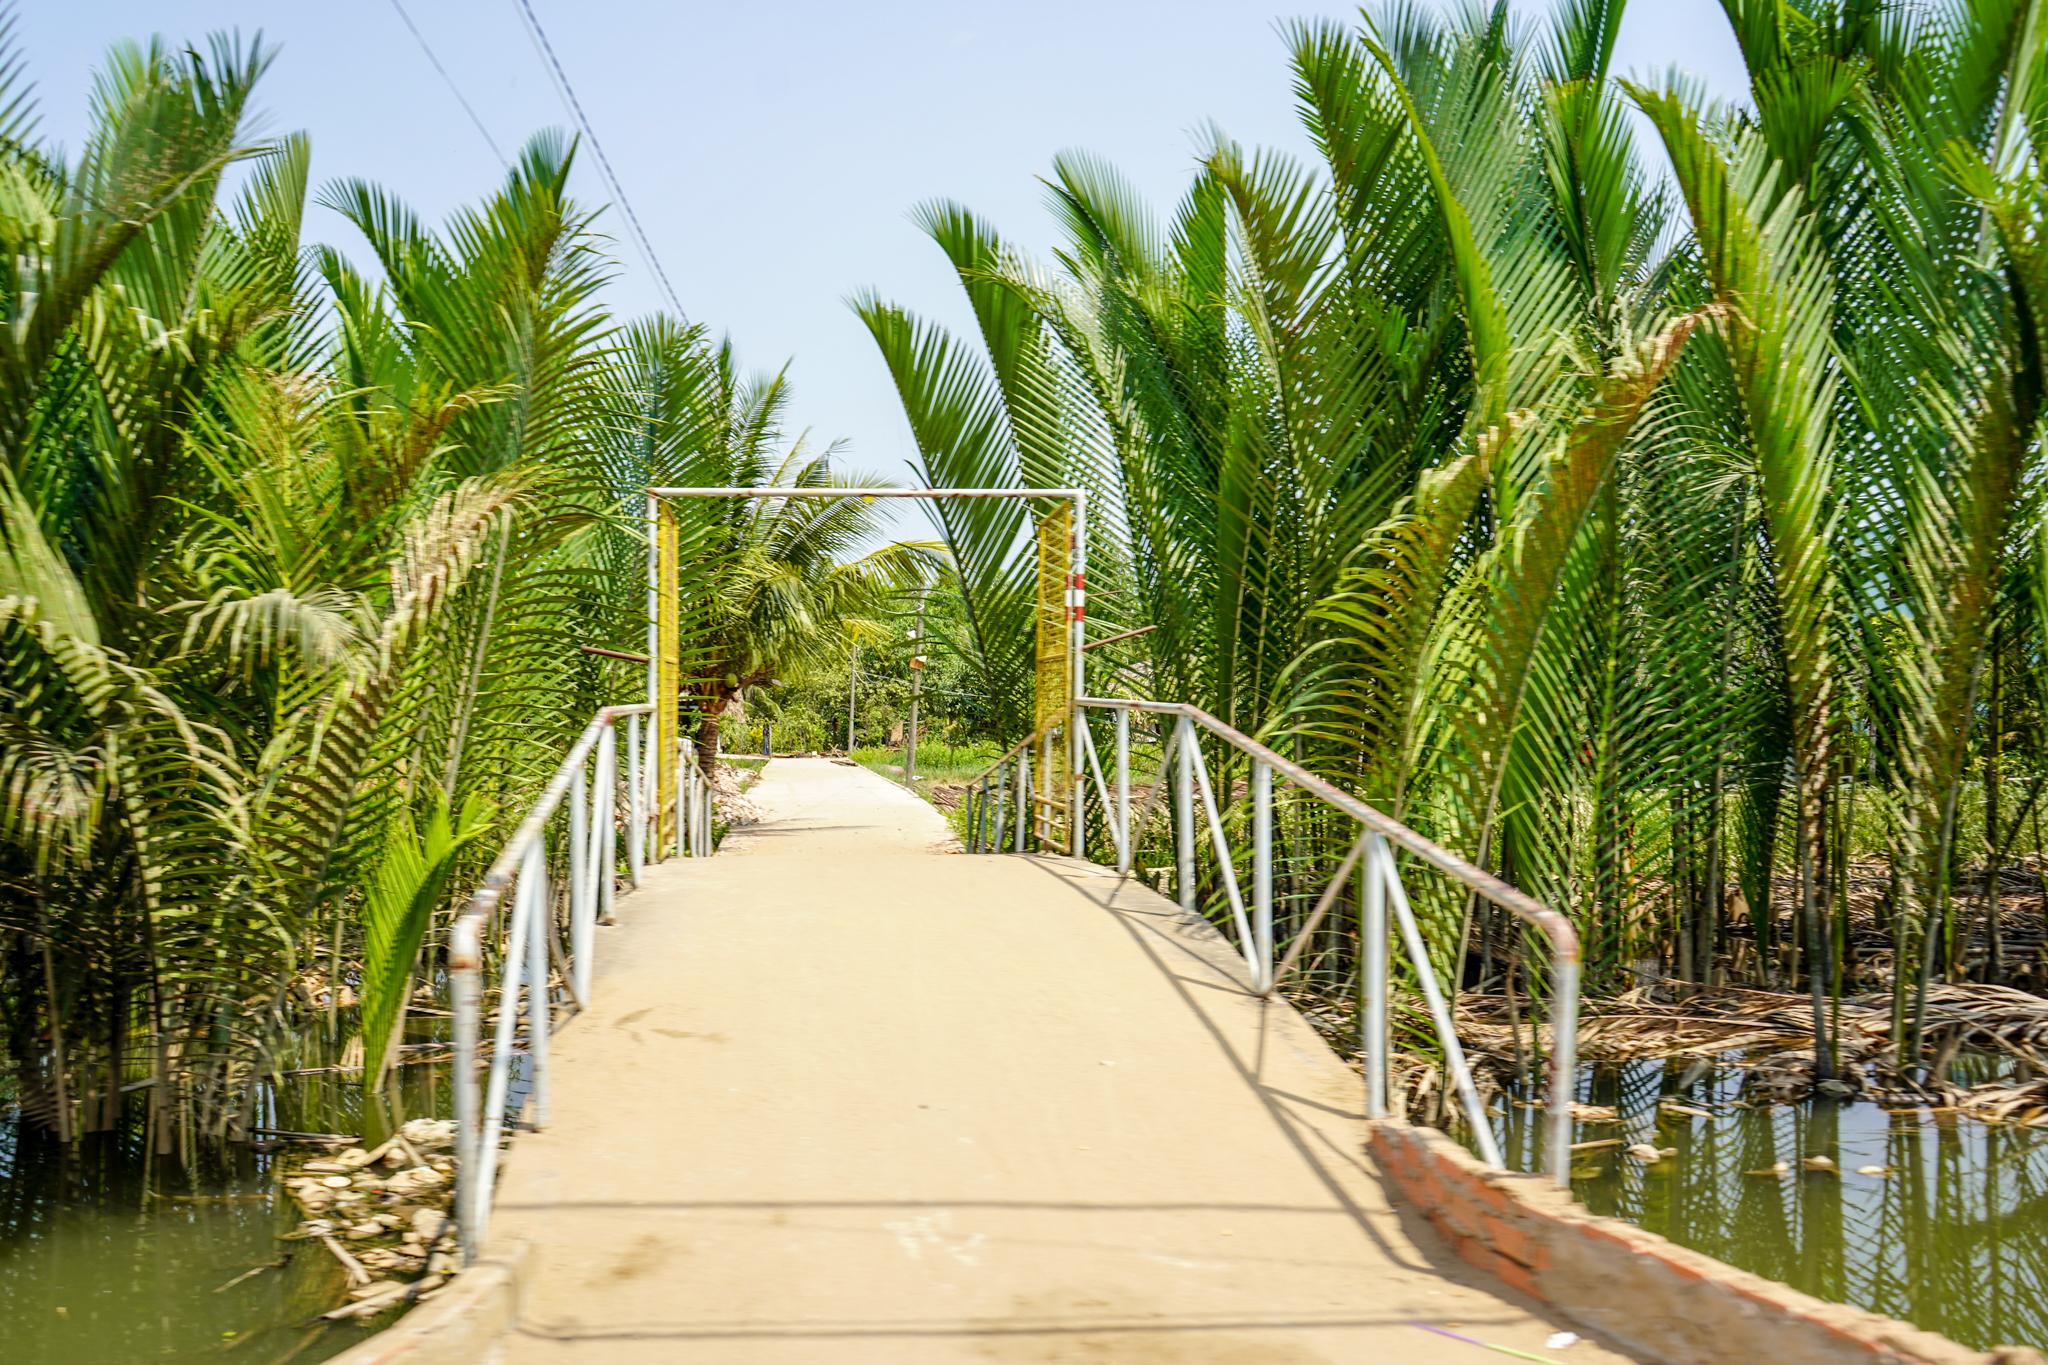 uprooted-traveler-48-hour-itinerary-saigon-mekong-delta-tour-vespa-adventures.jpg